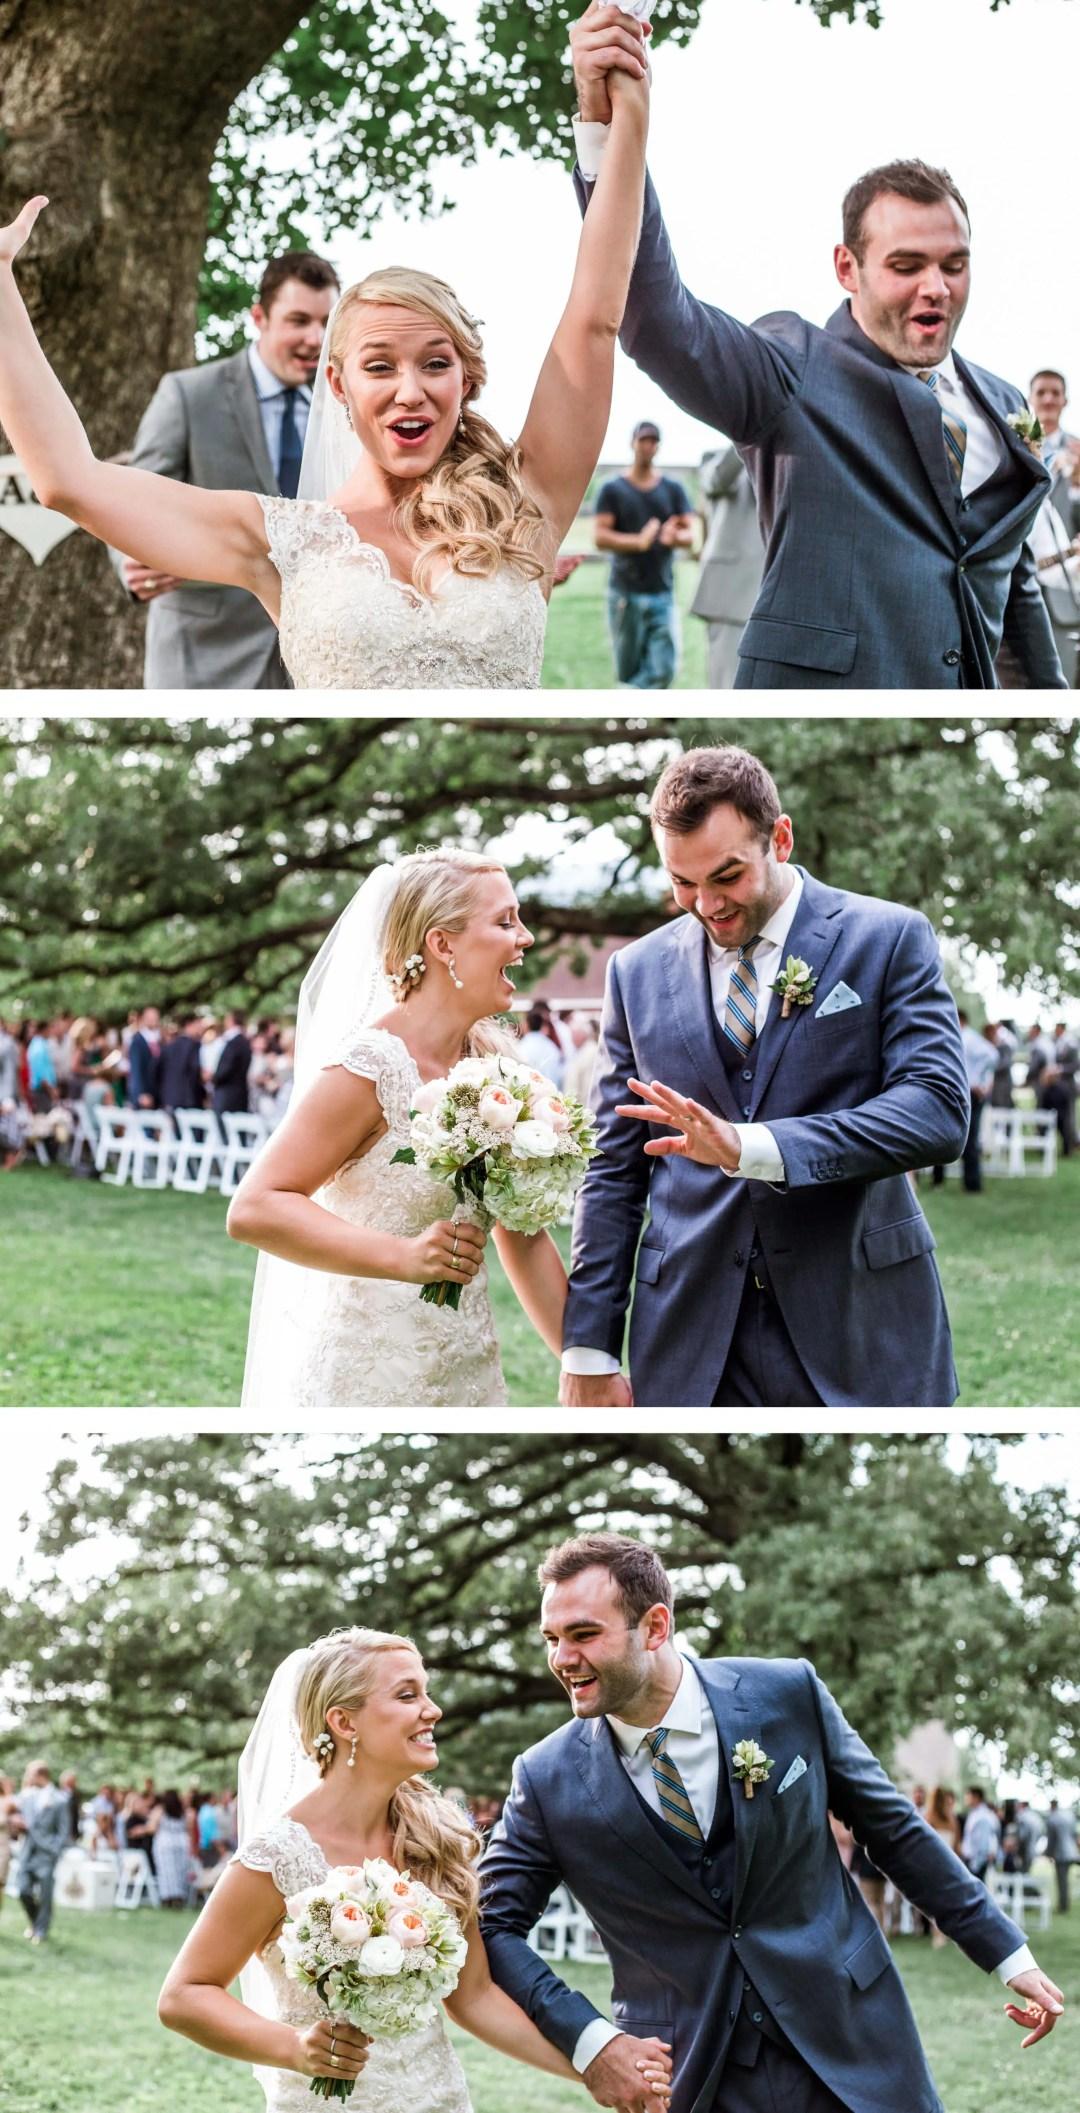 Sussex Wedding Photographer - ceremony recessional exit celebration